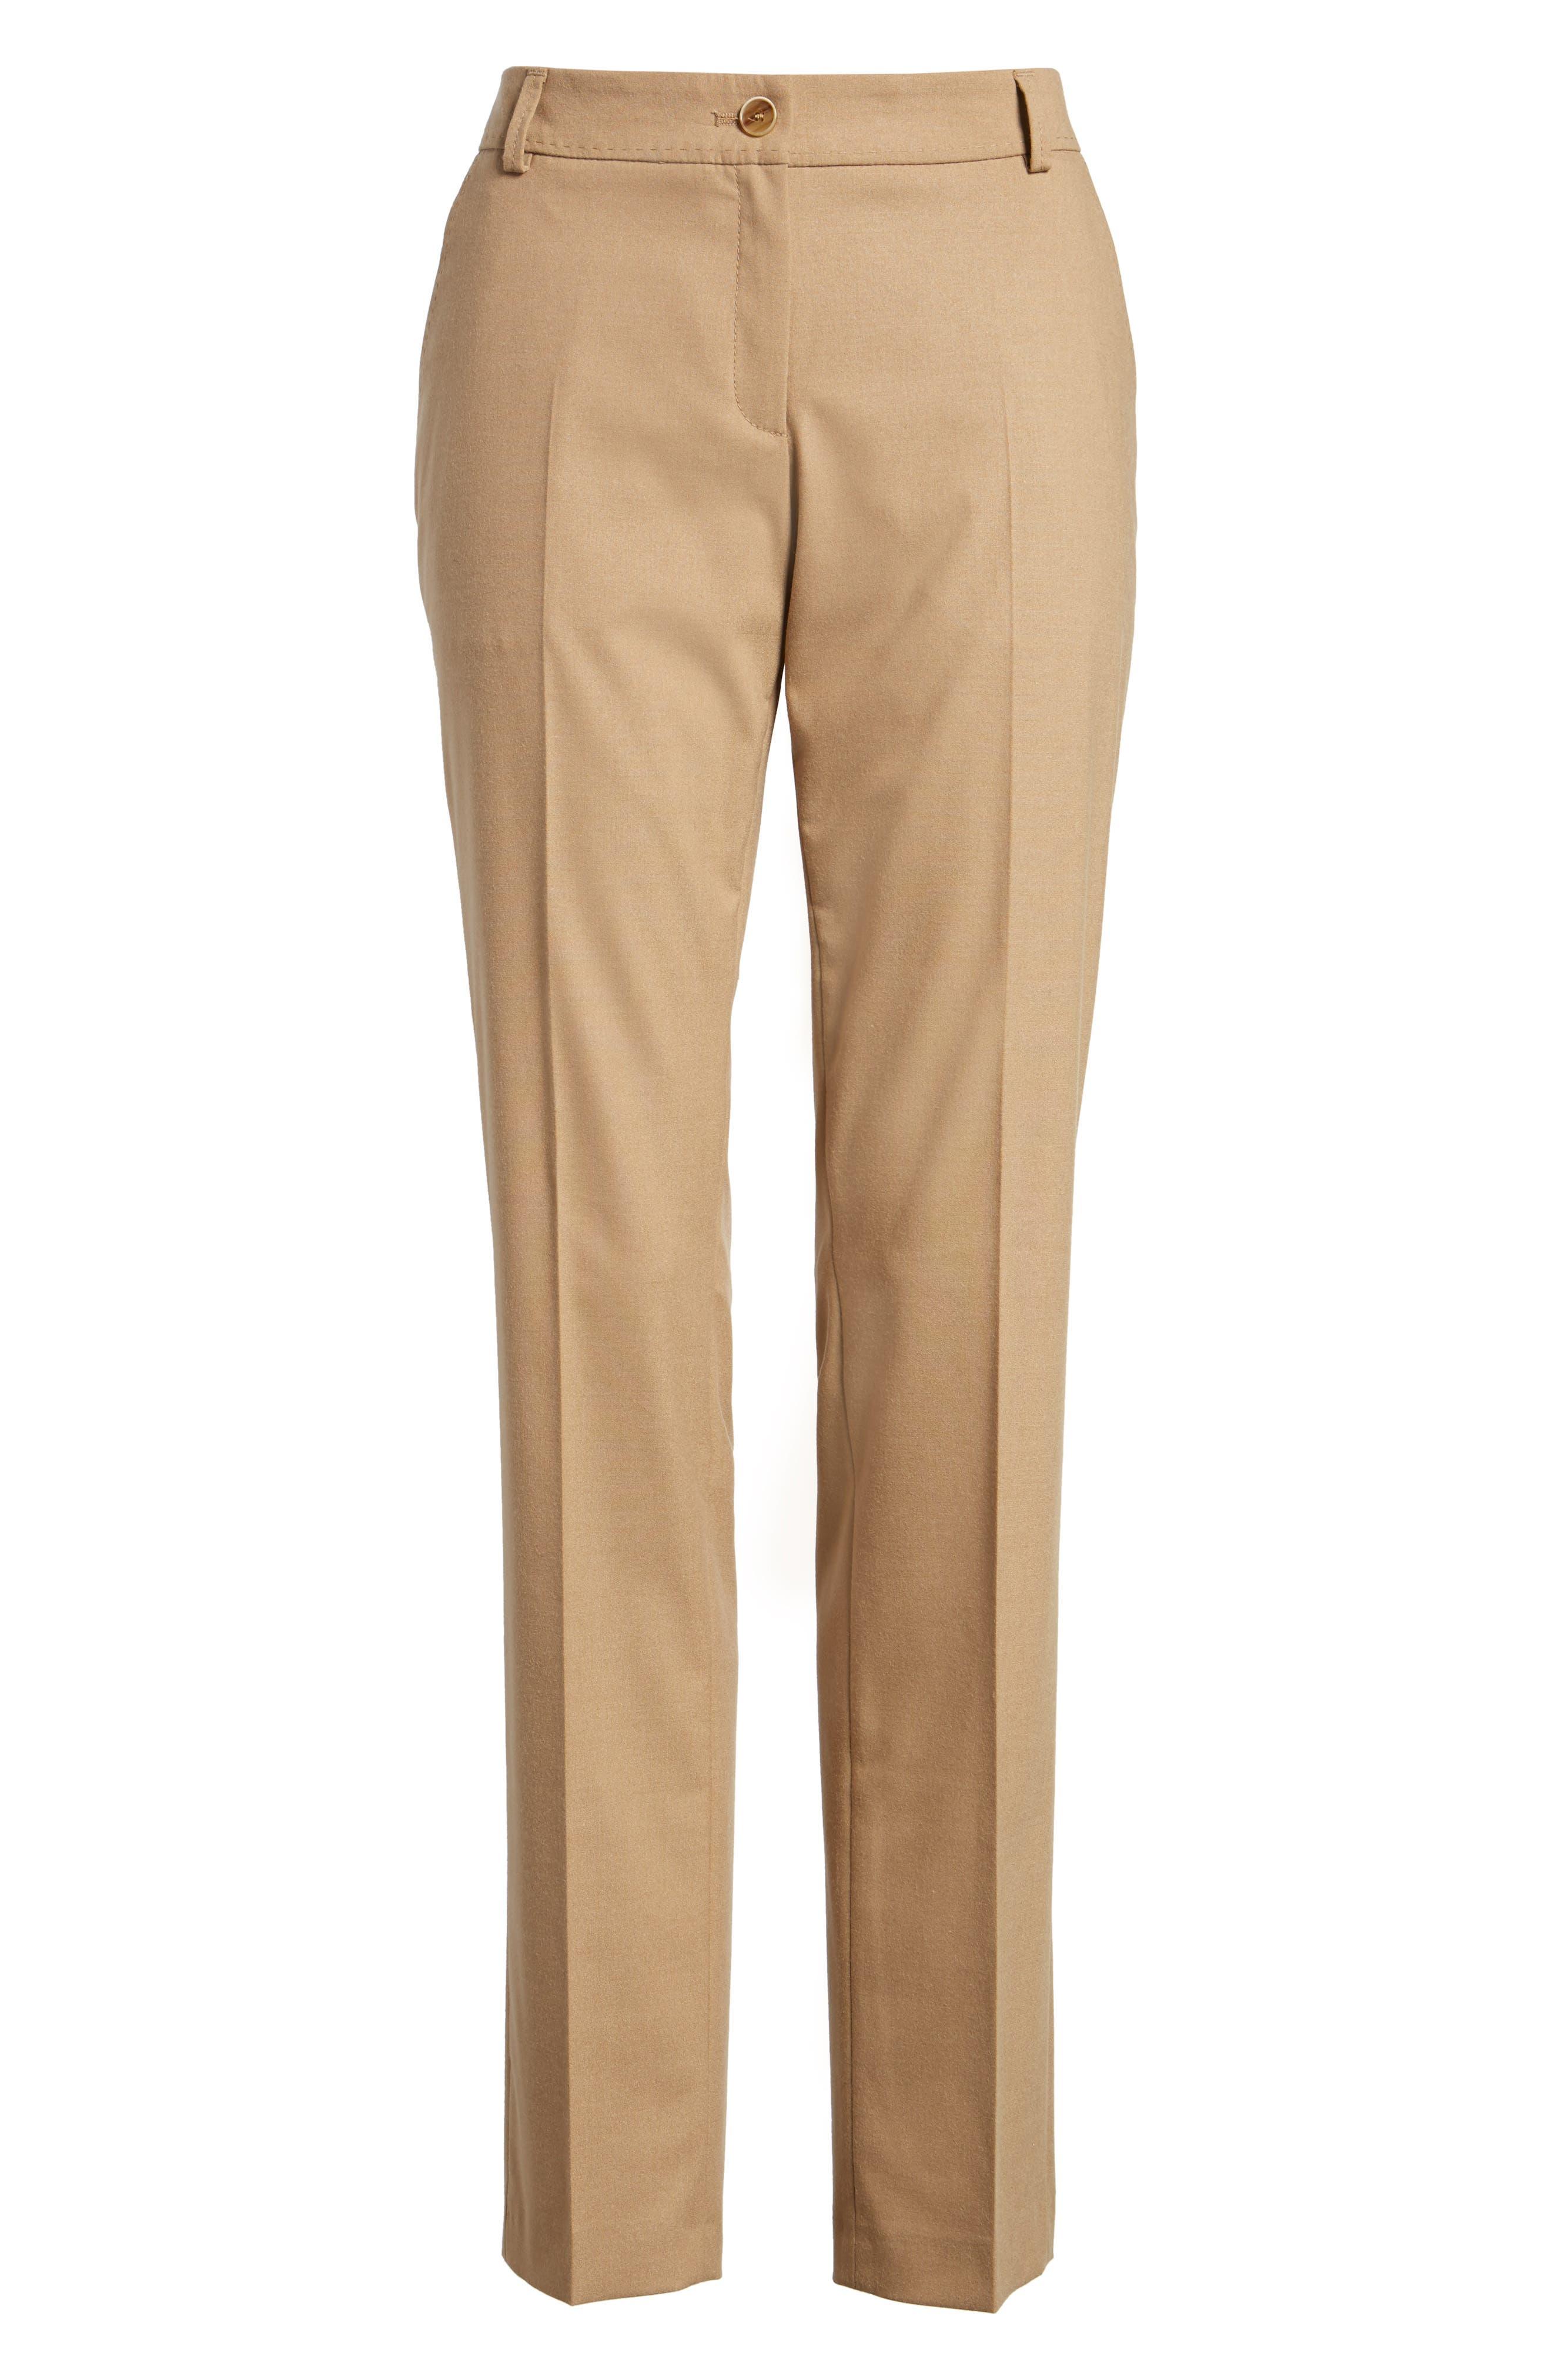 Straight Leg Trousers,                             Alternate thumbnail 6, color,                             Camel